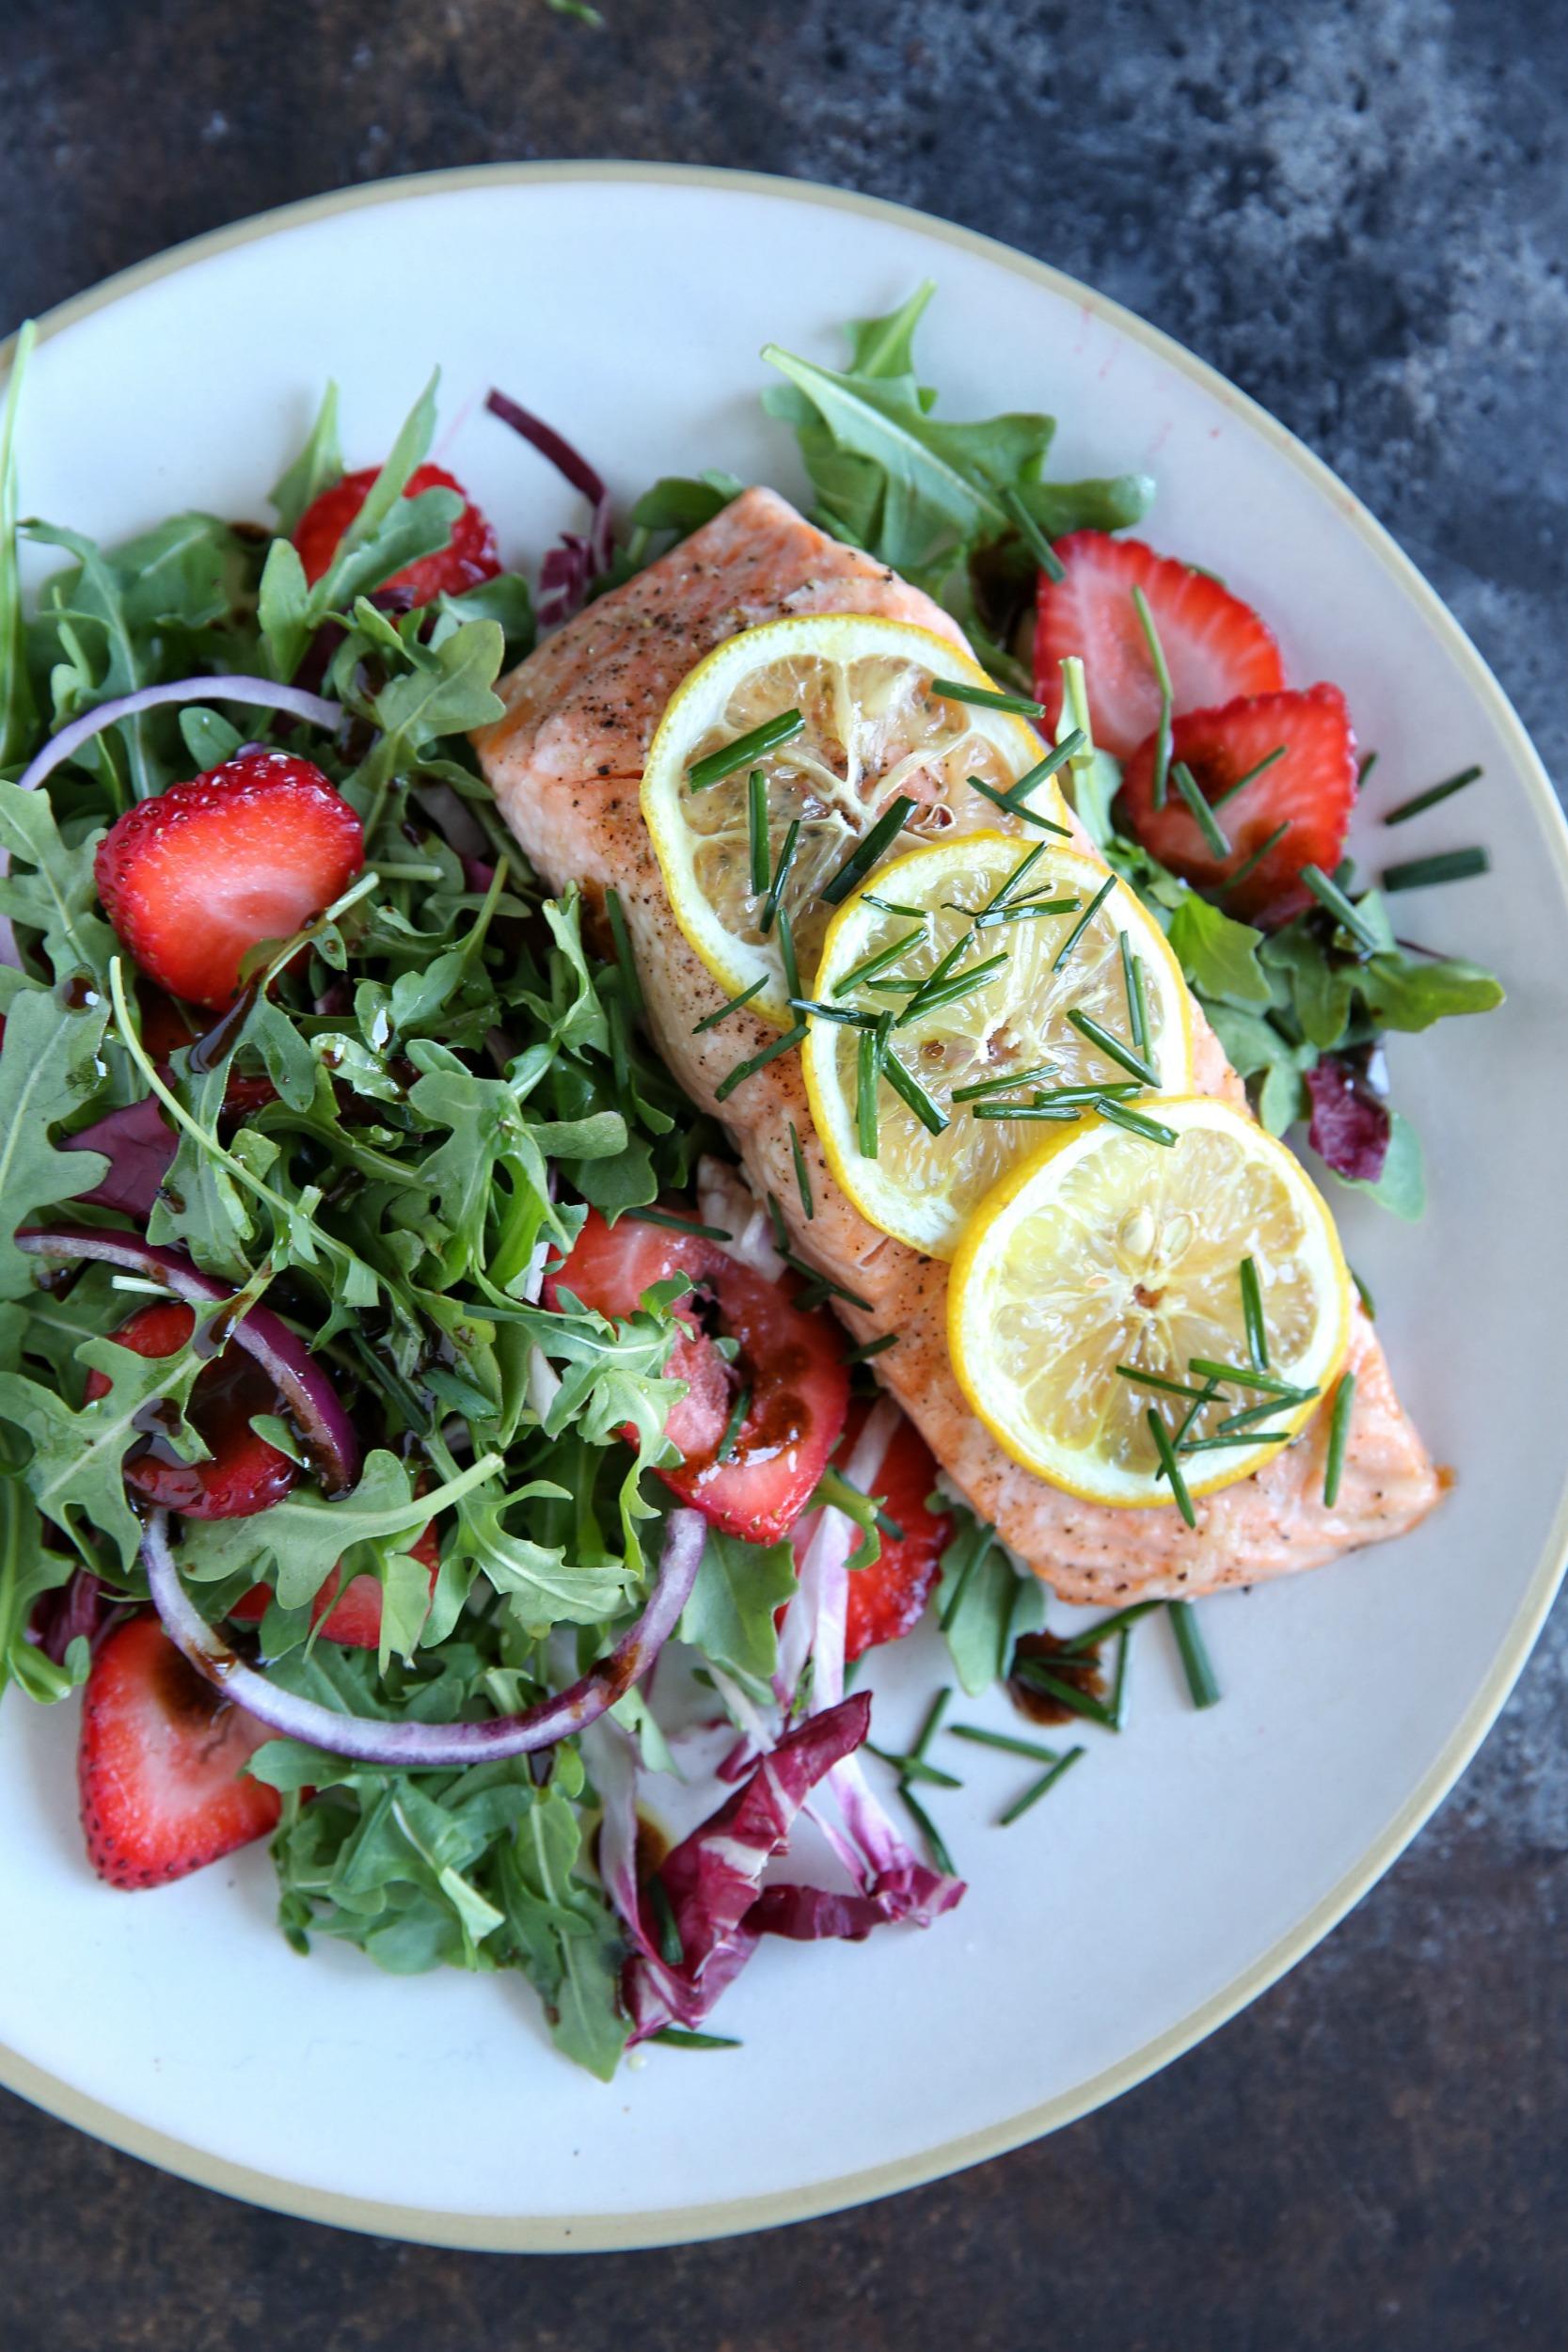 Healthiest Salad Dressing